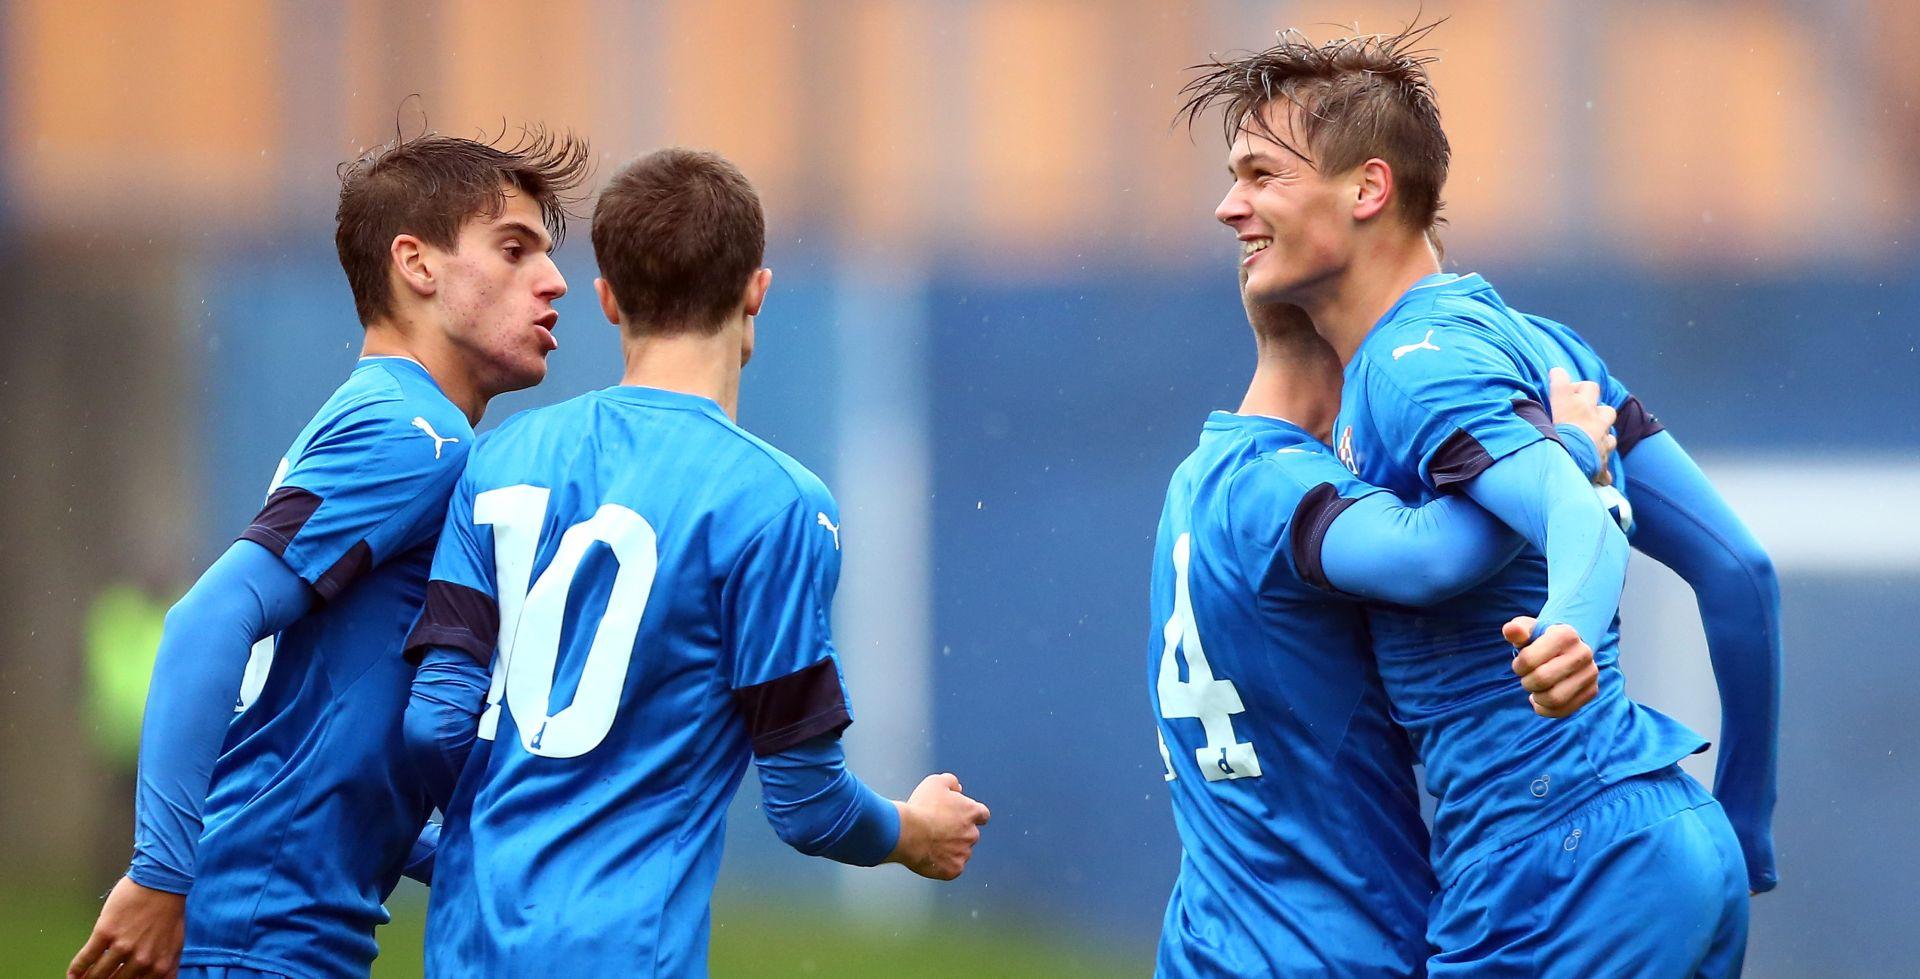 JUNIORSKA LIGA PRVAKA Dinamo se oprostio pobjedom nad Juventusom